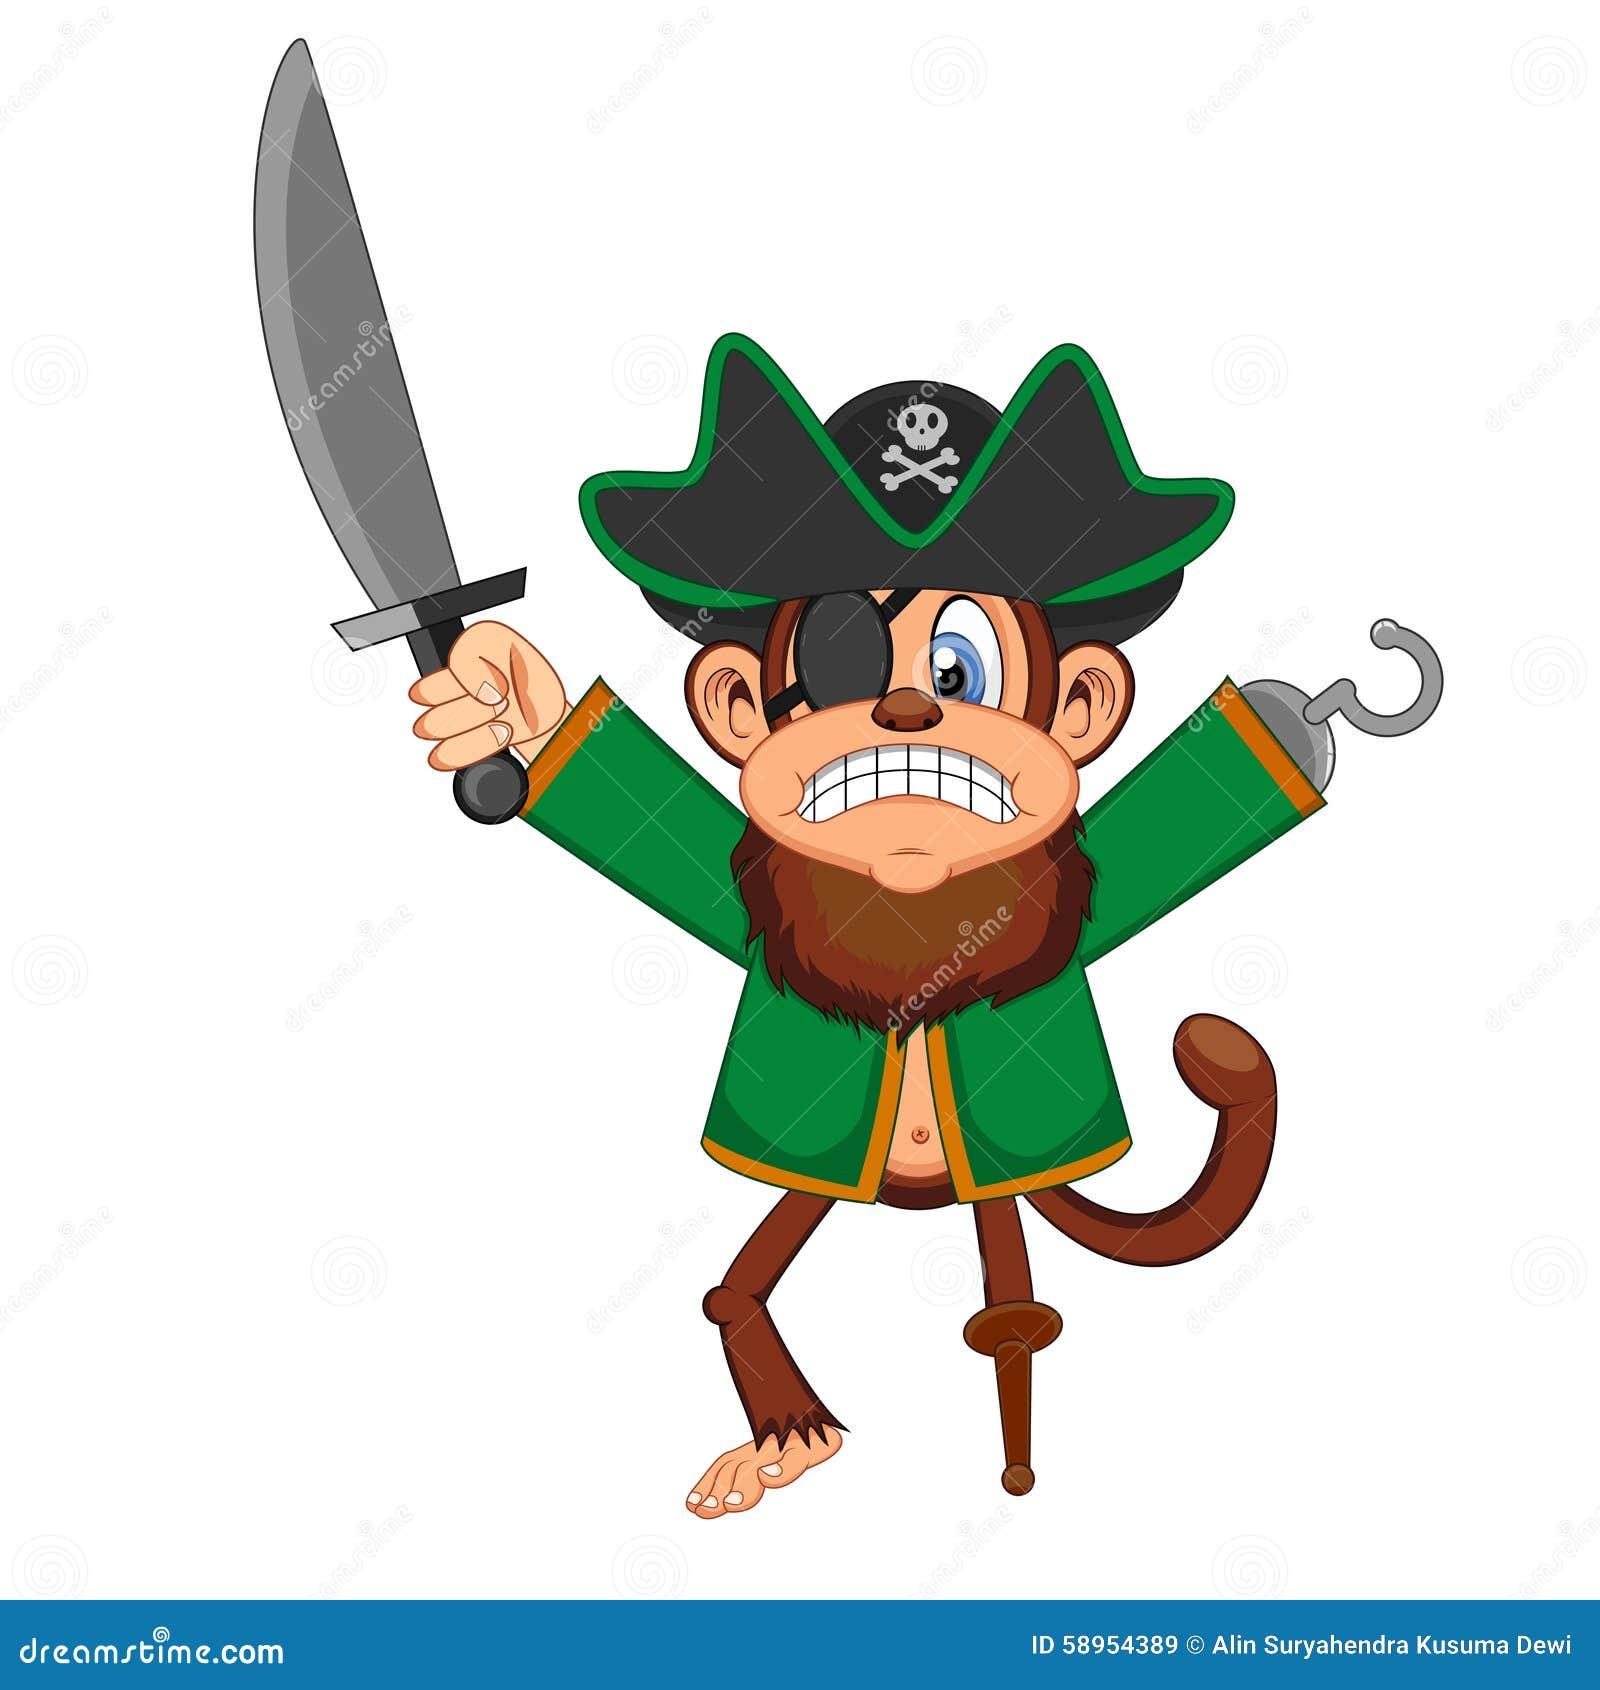 Monkey Pirate Cartoon Clipart Vector - FriendlyStock   Cartoon clip art, Pirate  cartoon, Cartoon